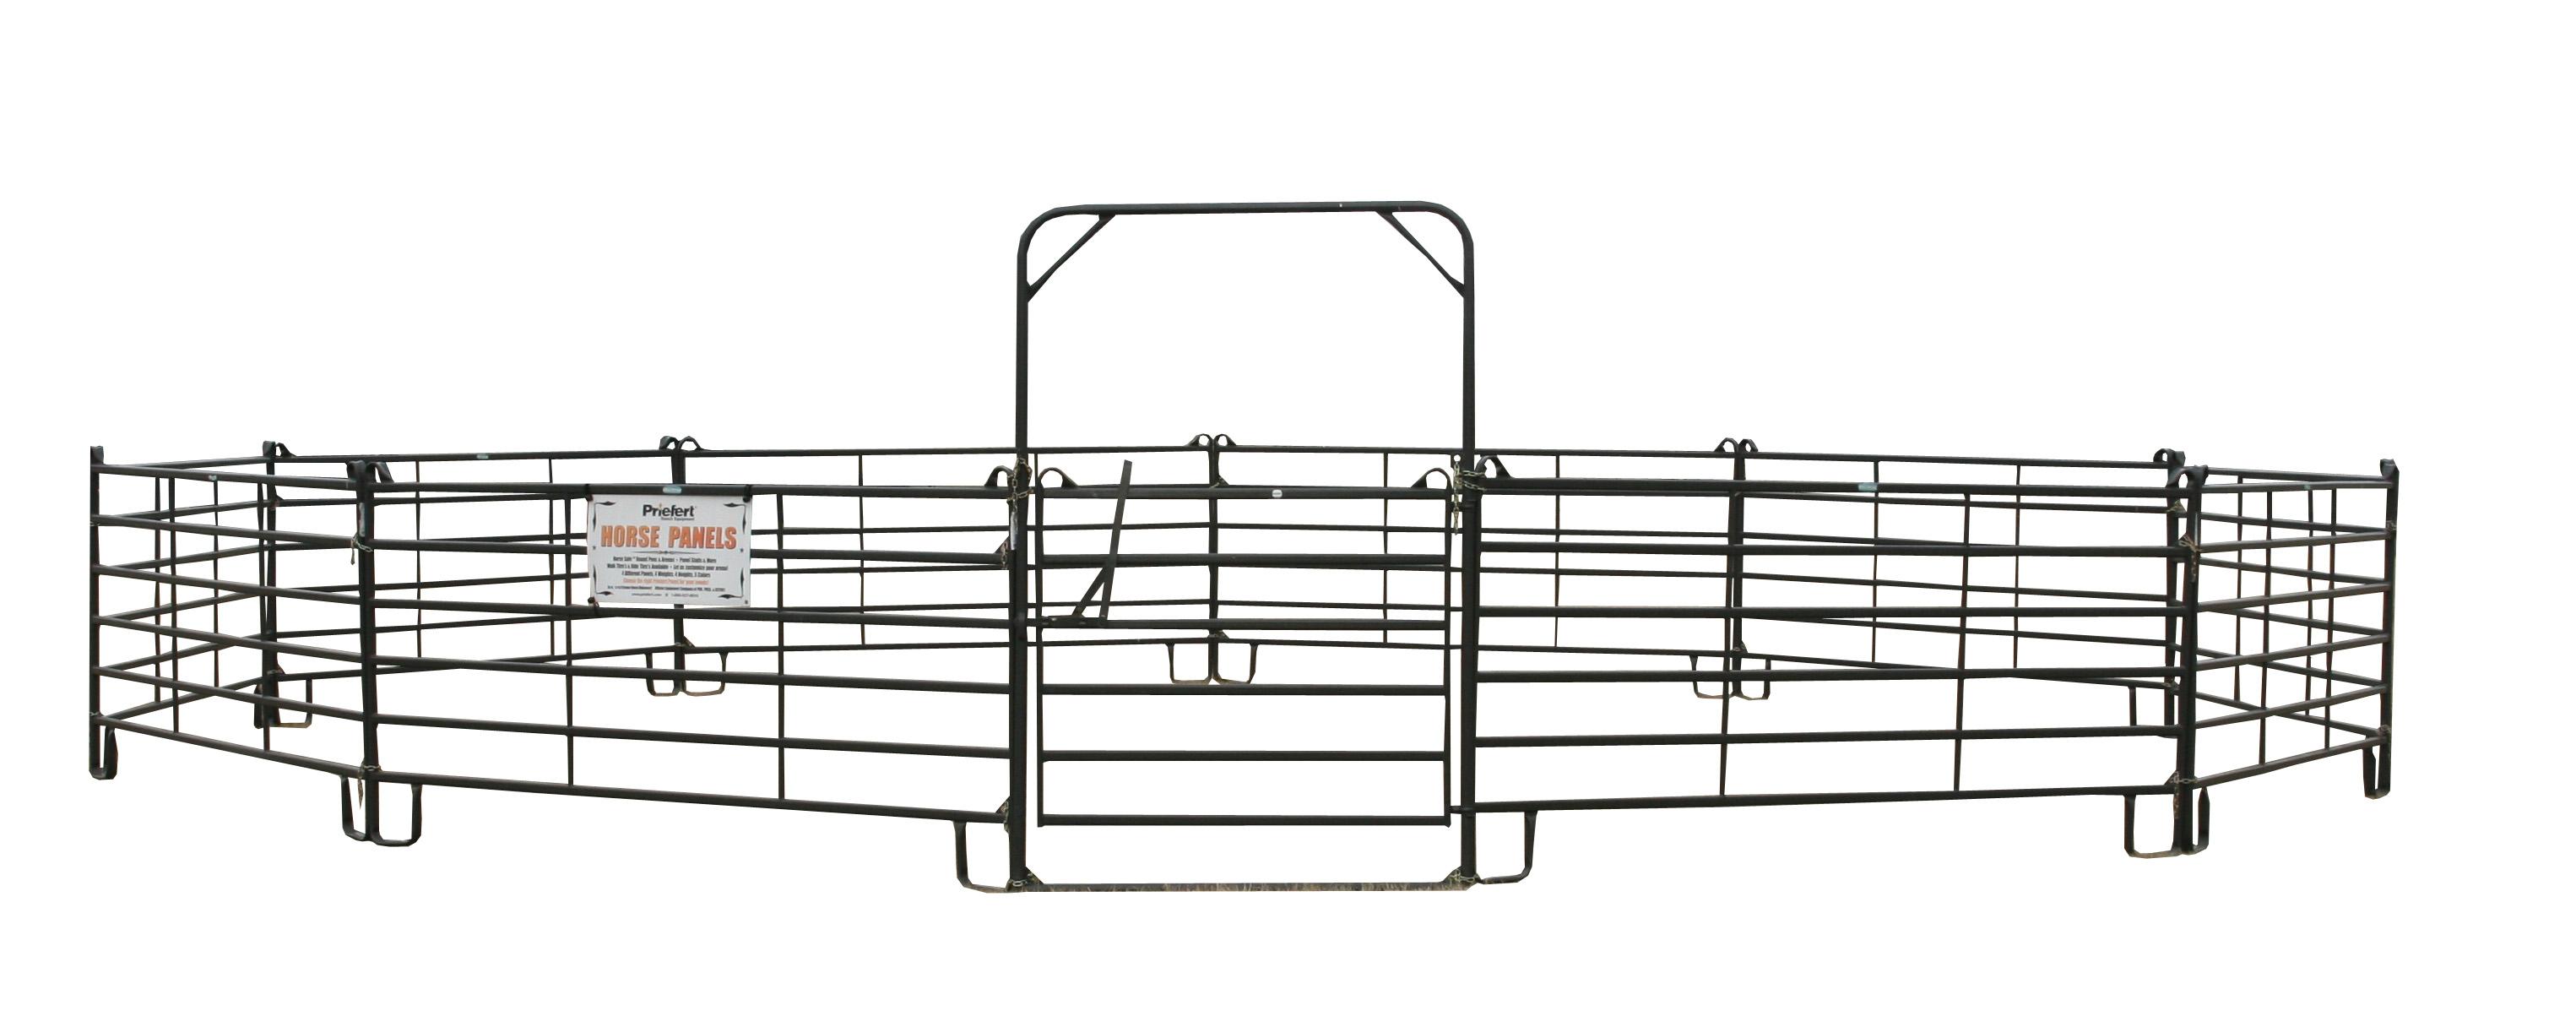 Fantastic Wire Hog Illustration - Schematic diagram and wiring ...